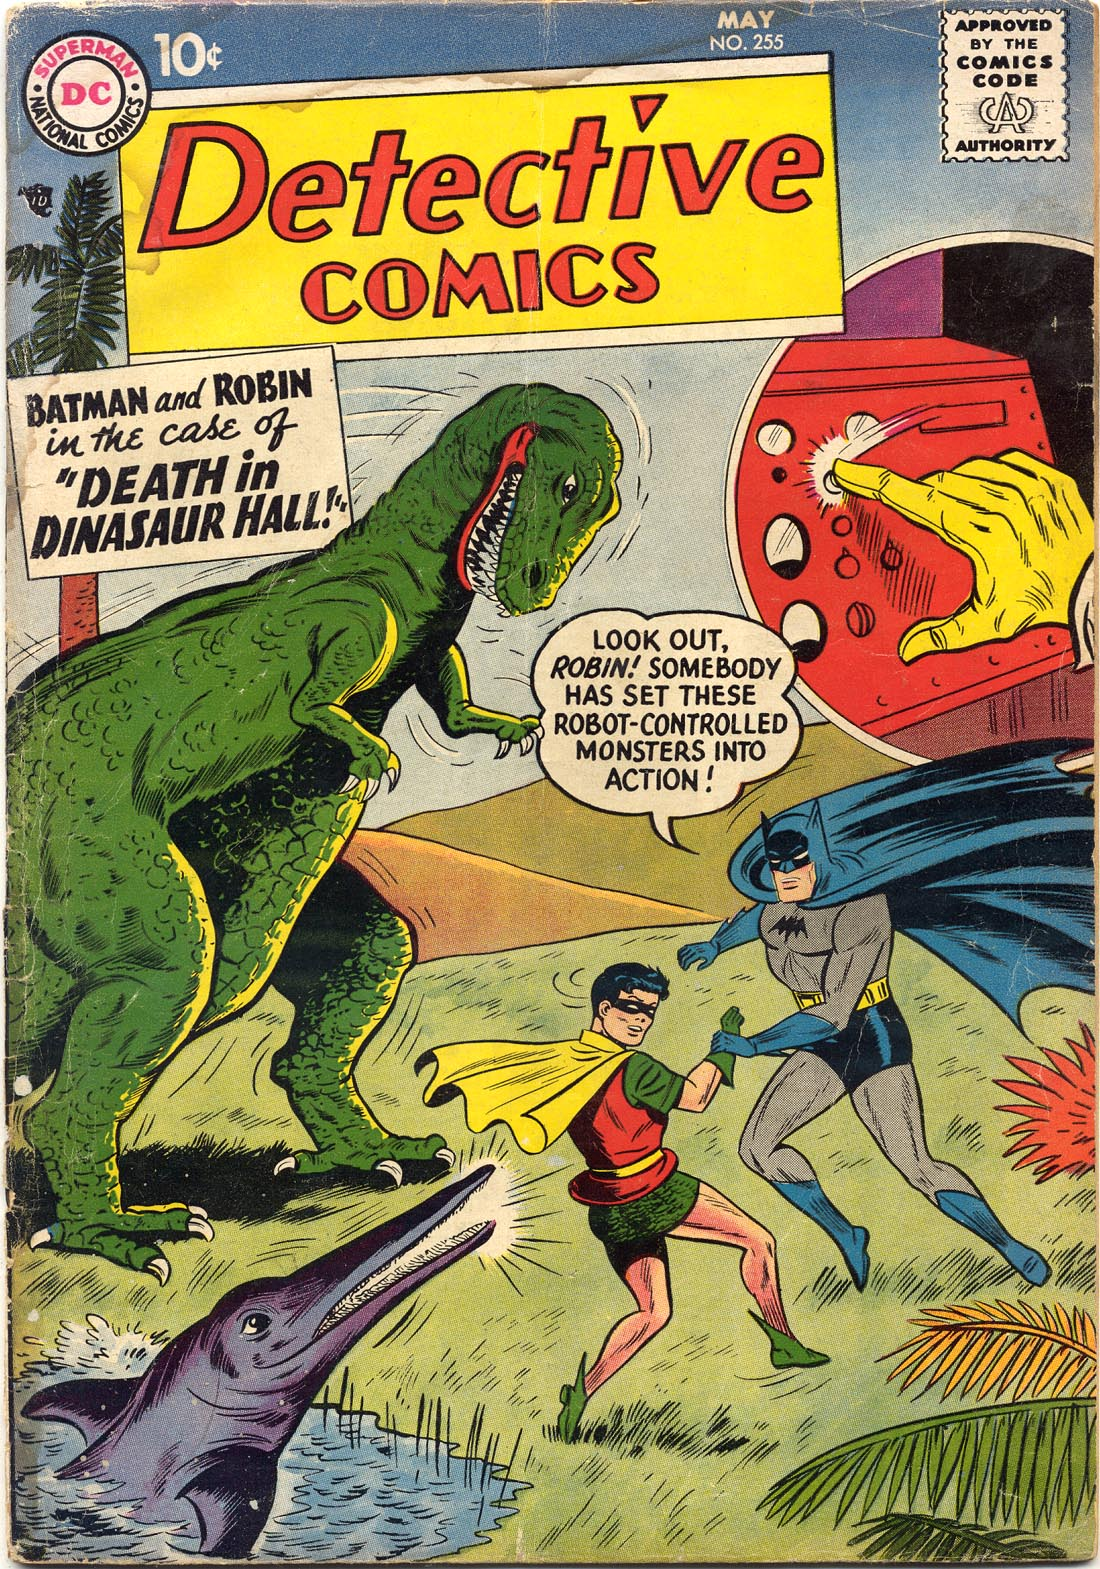 Read online Detective Comics (1937) comic -  Issue #255 - 1